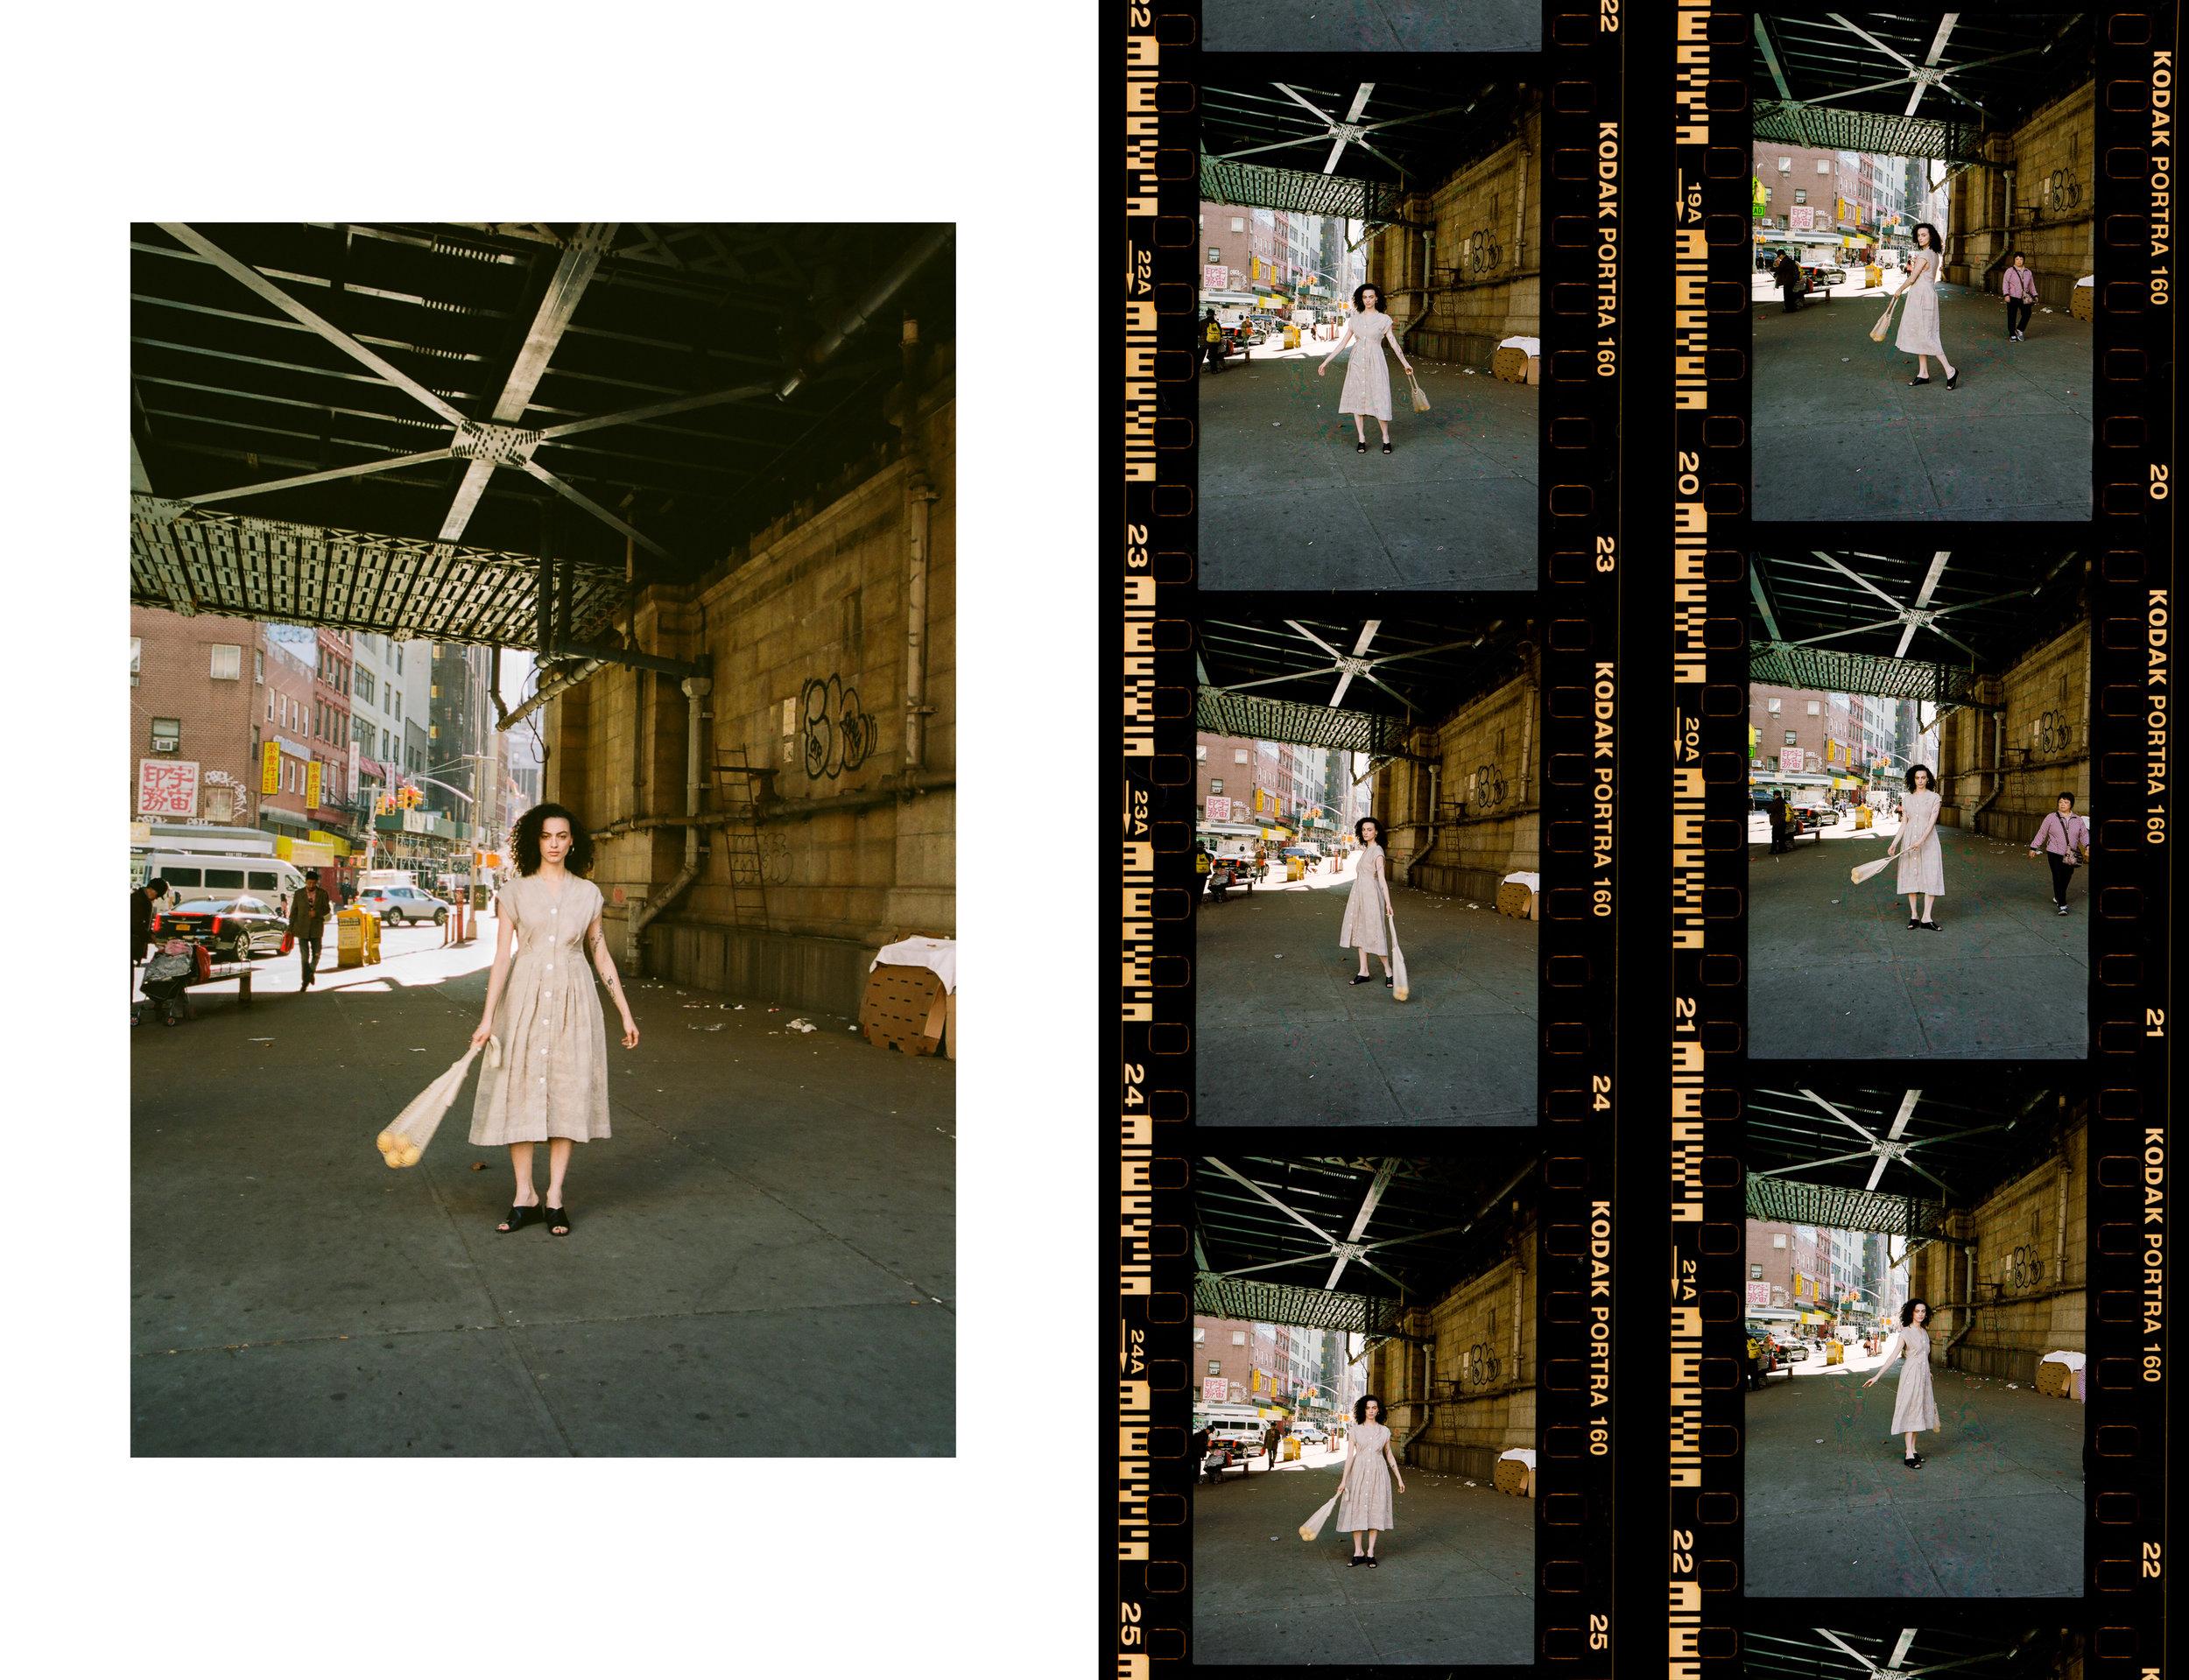 20190425_untitled shoot026-Edit-Edit.jpg